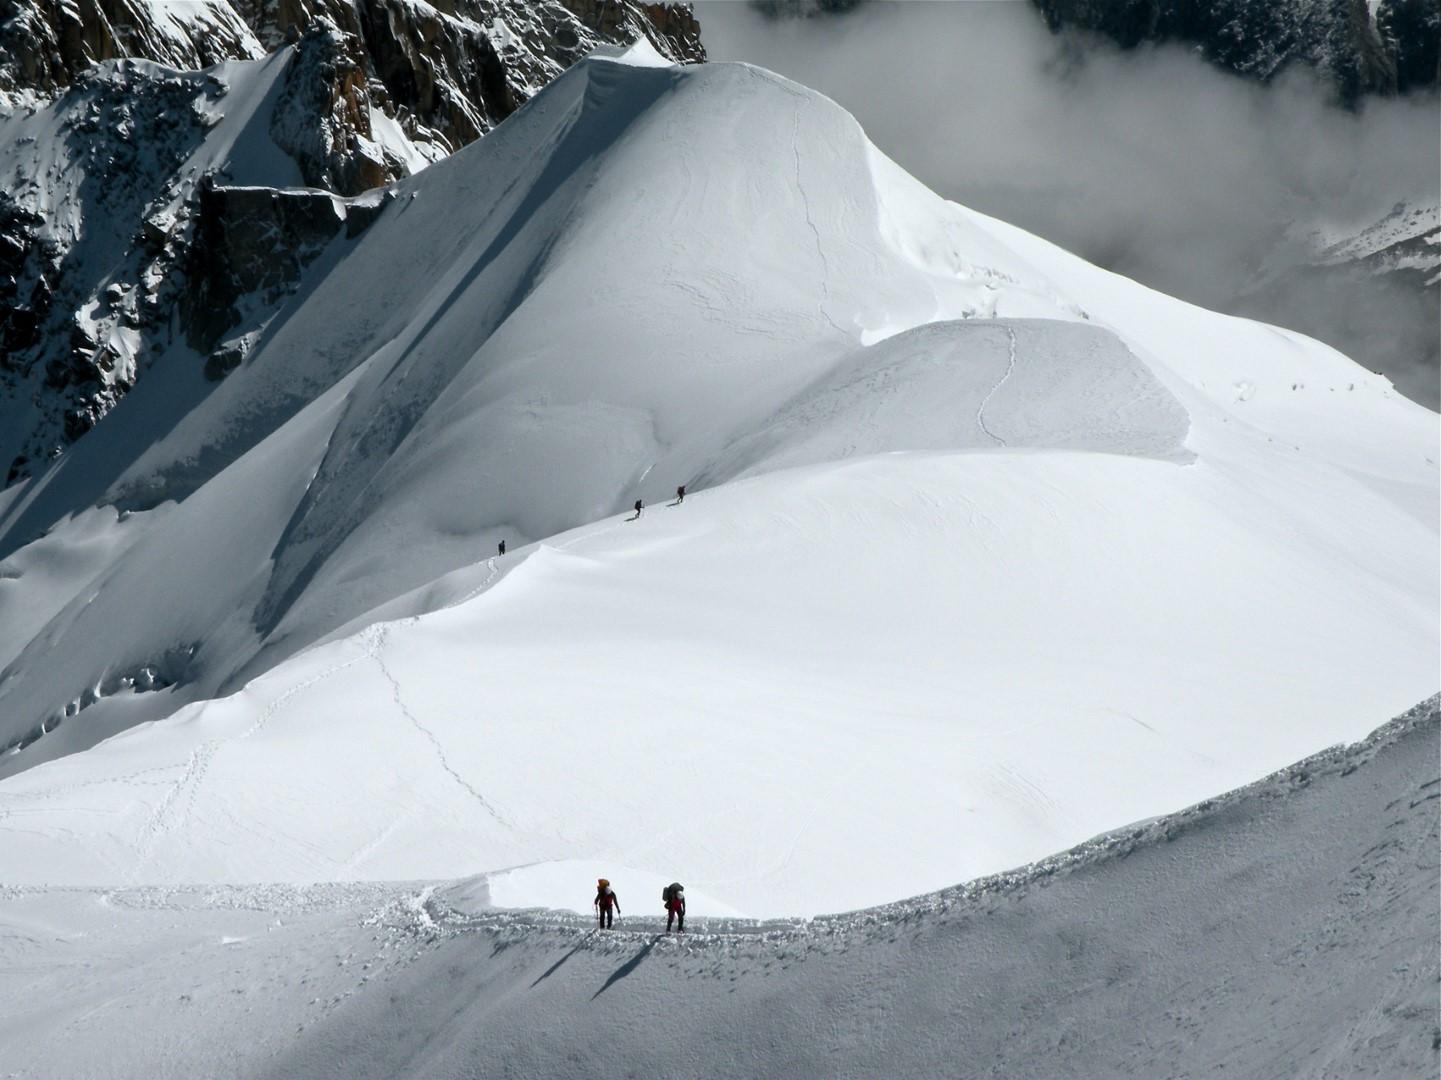 Arista de Midi. Alpes. Francia. 2010. Benito Jiménez Martinez. (Grande)